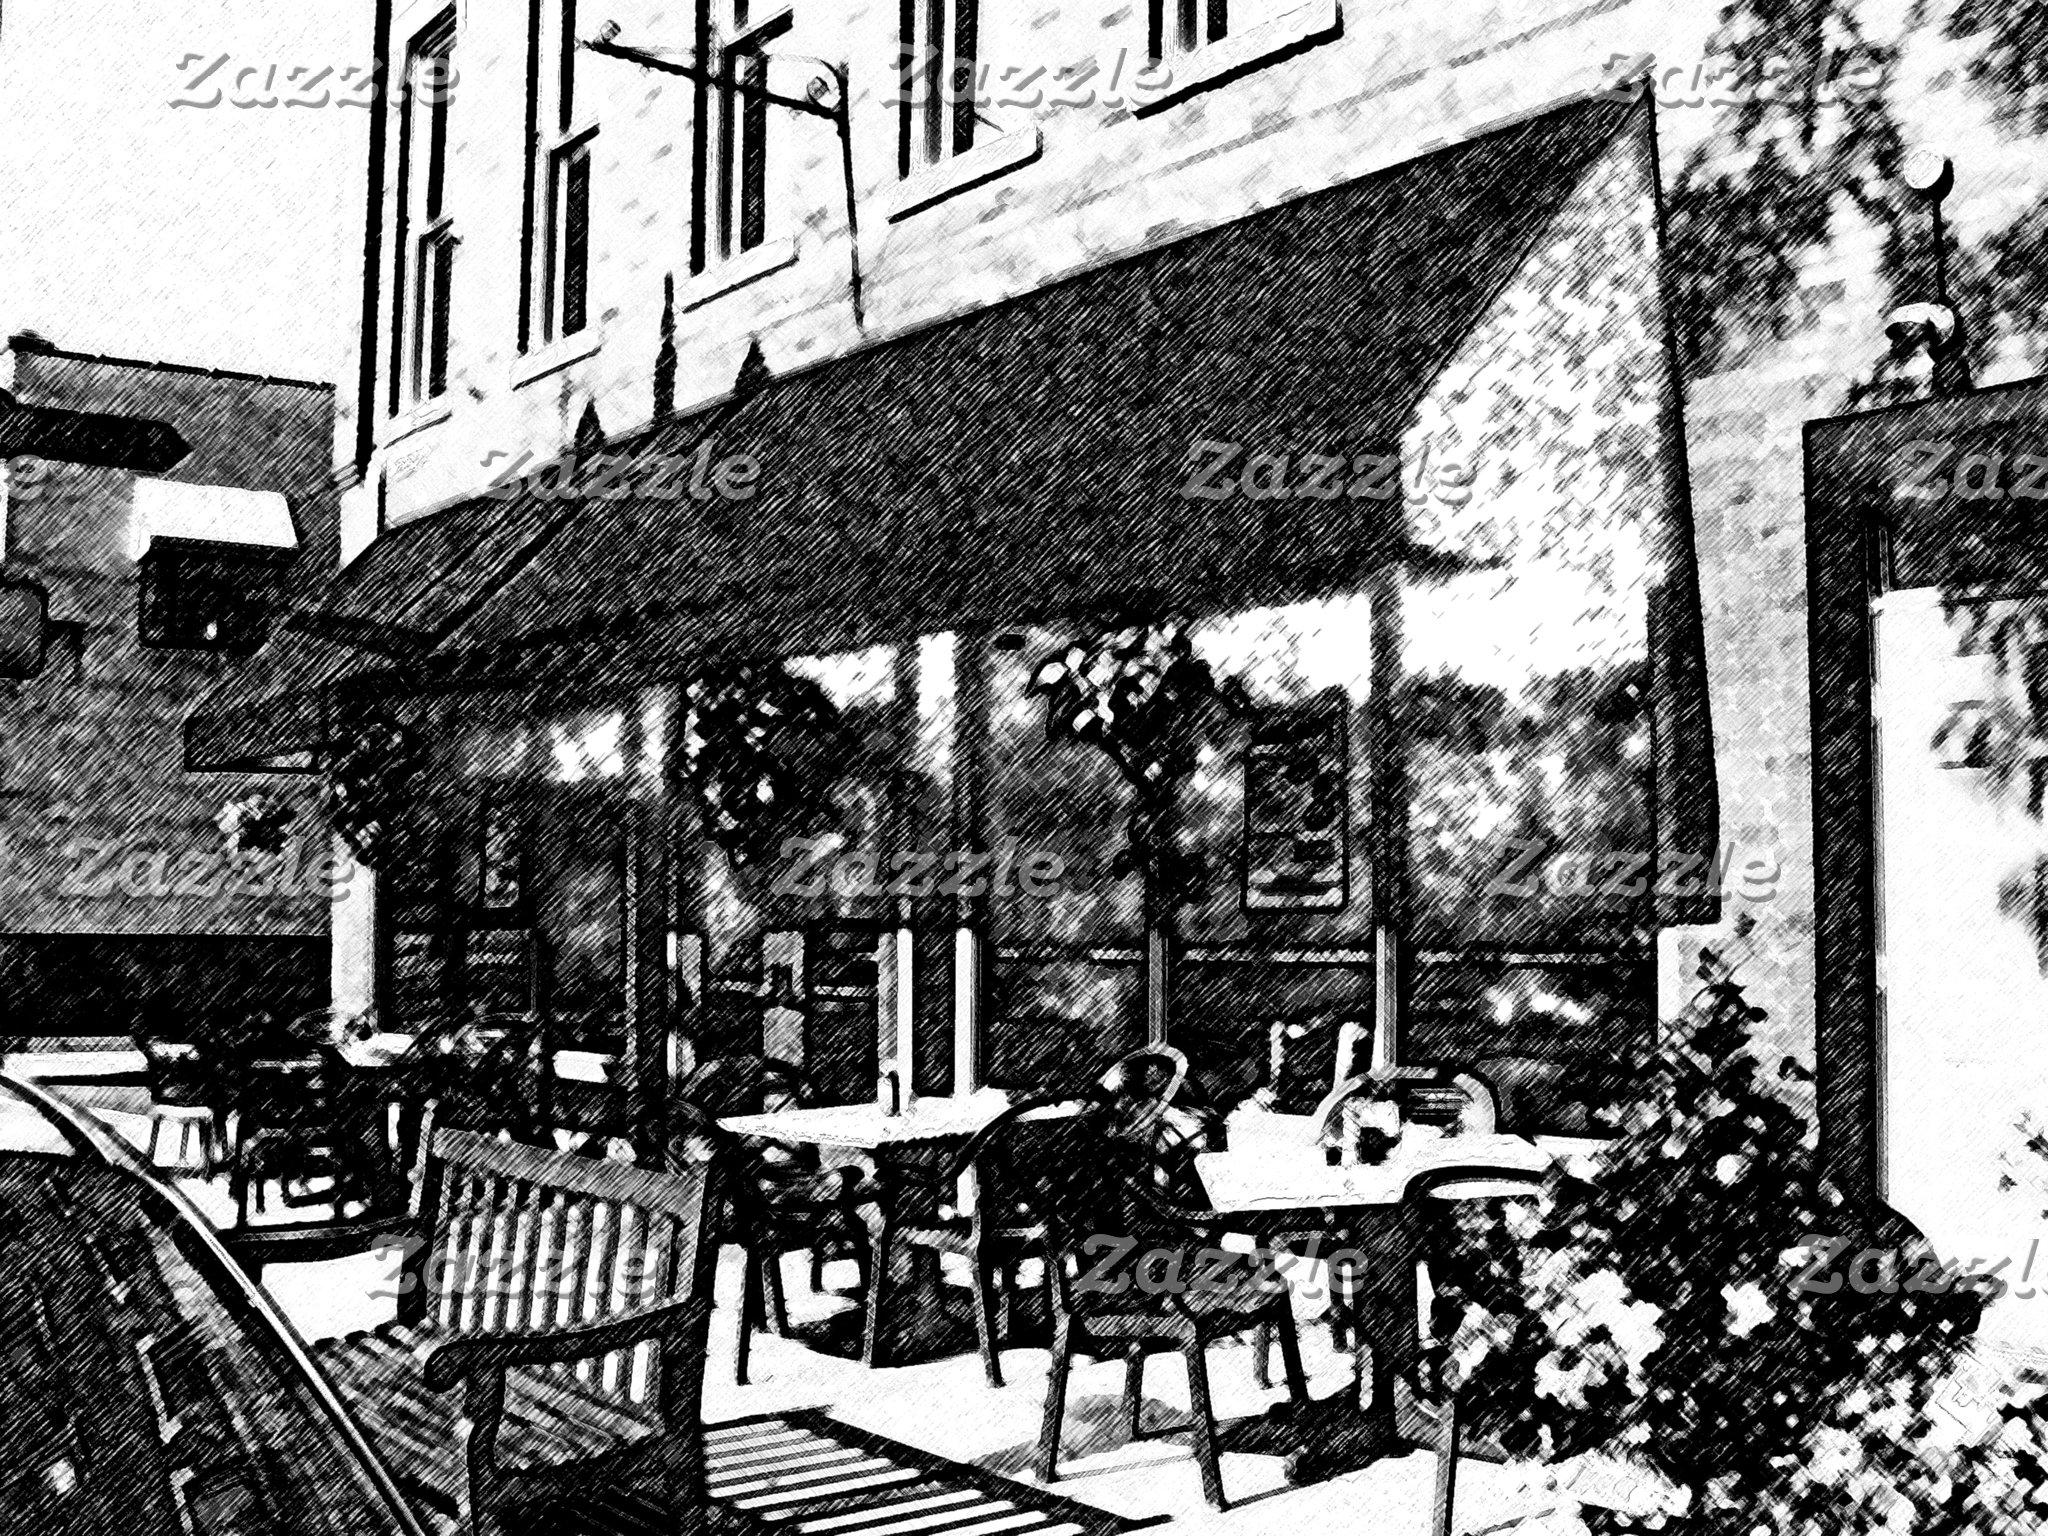 Sidewalk Cafe, Westerville, Ohio